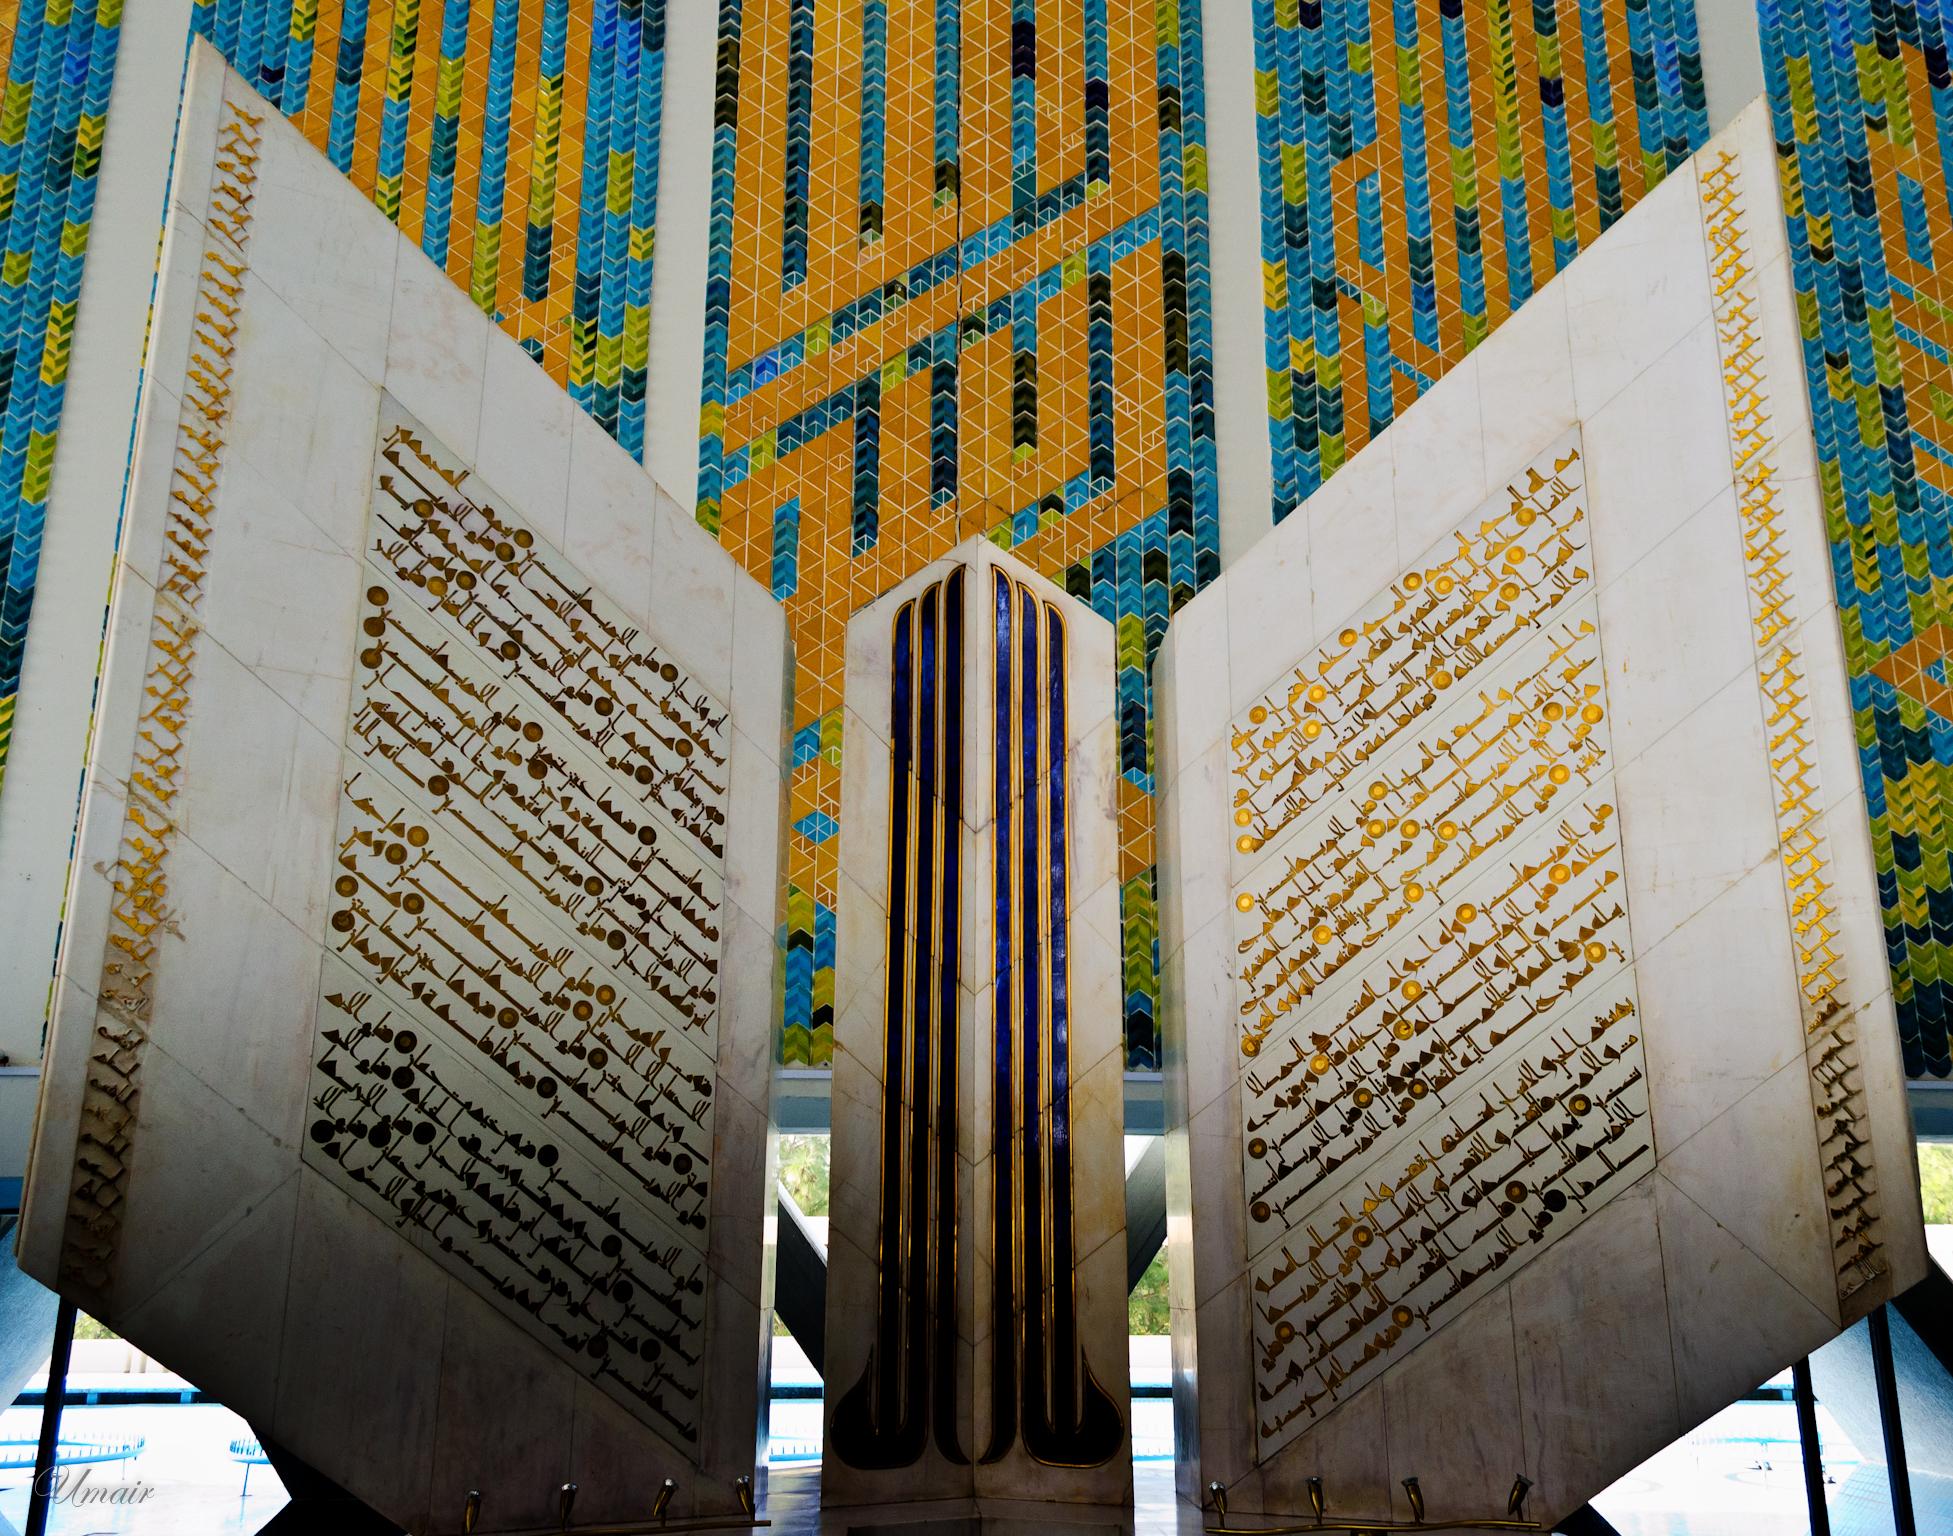 File:Inside Faisal mosque.jpg - Wikimedia Commons